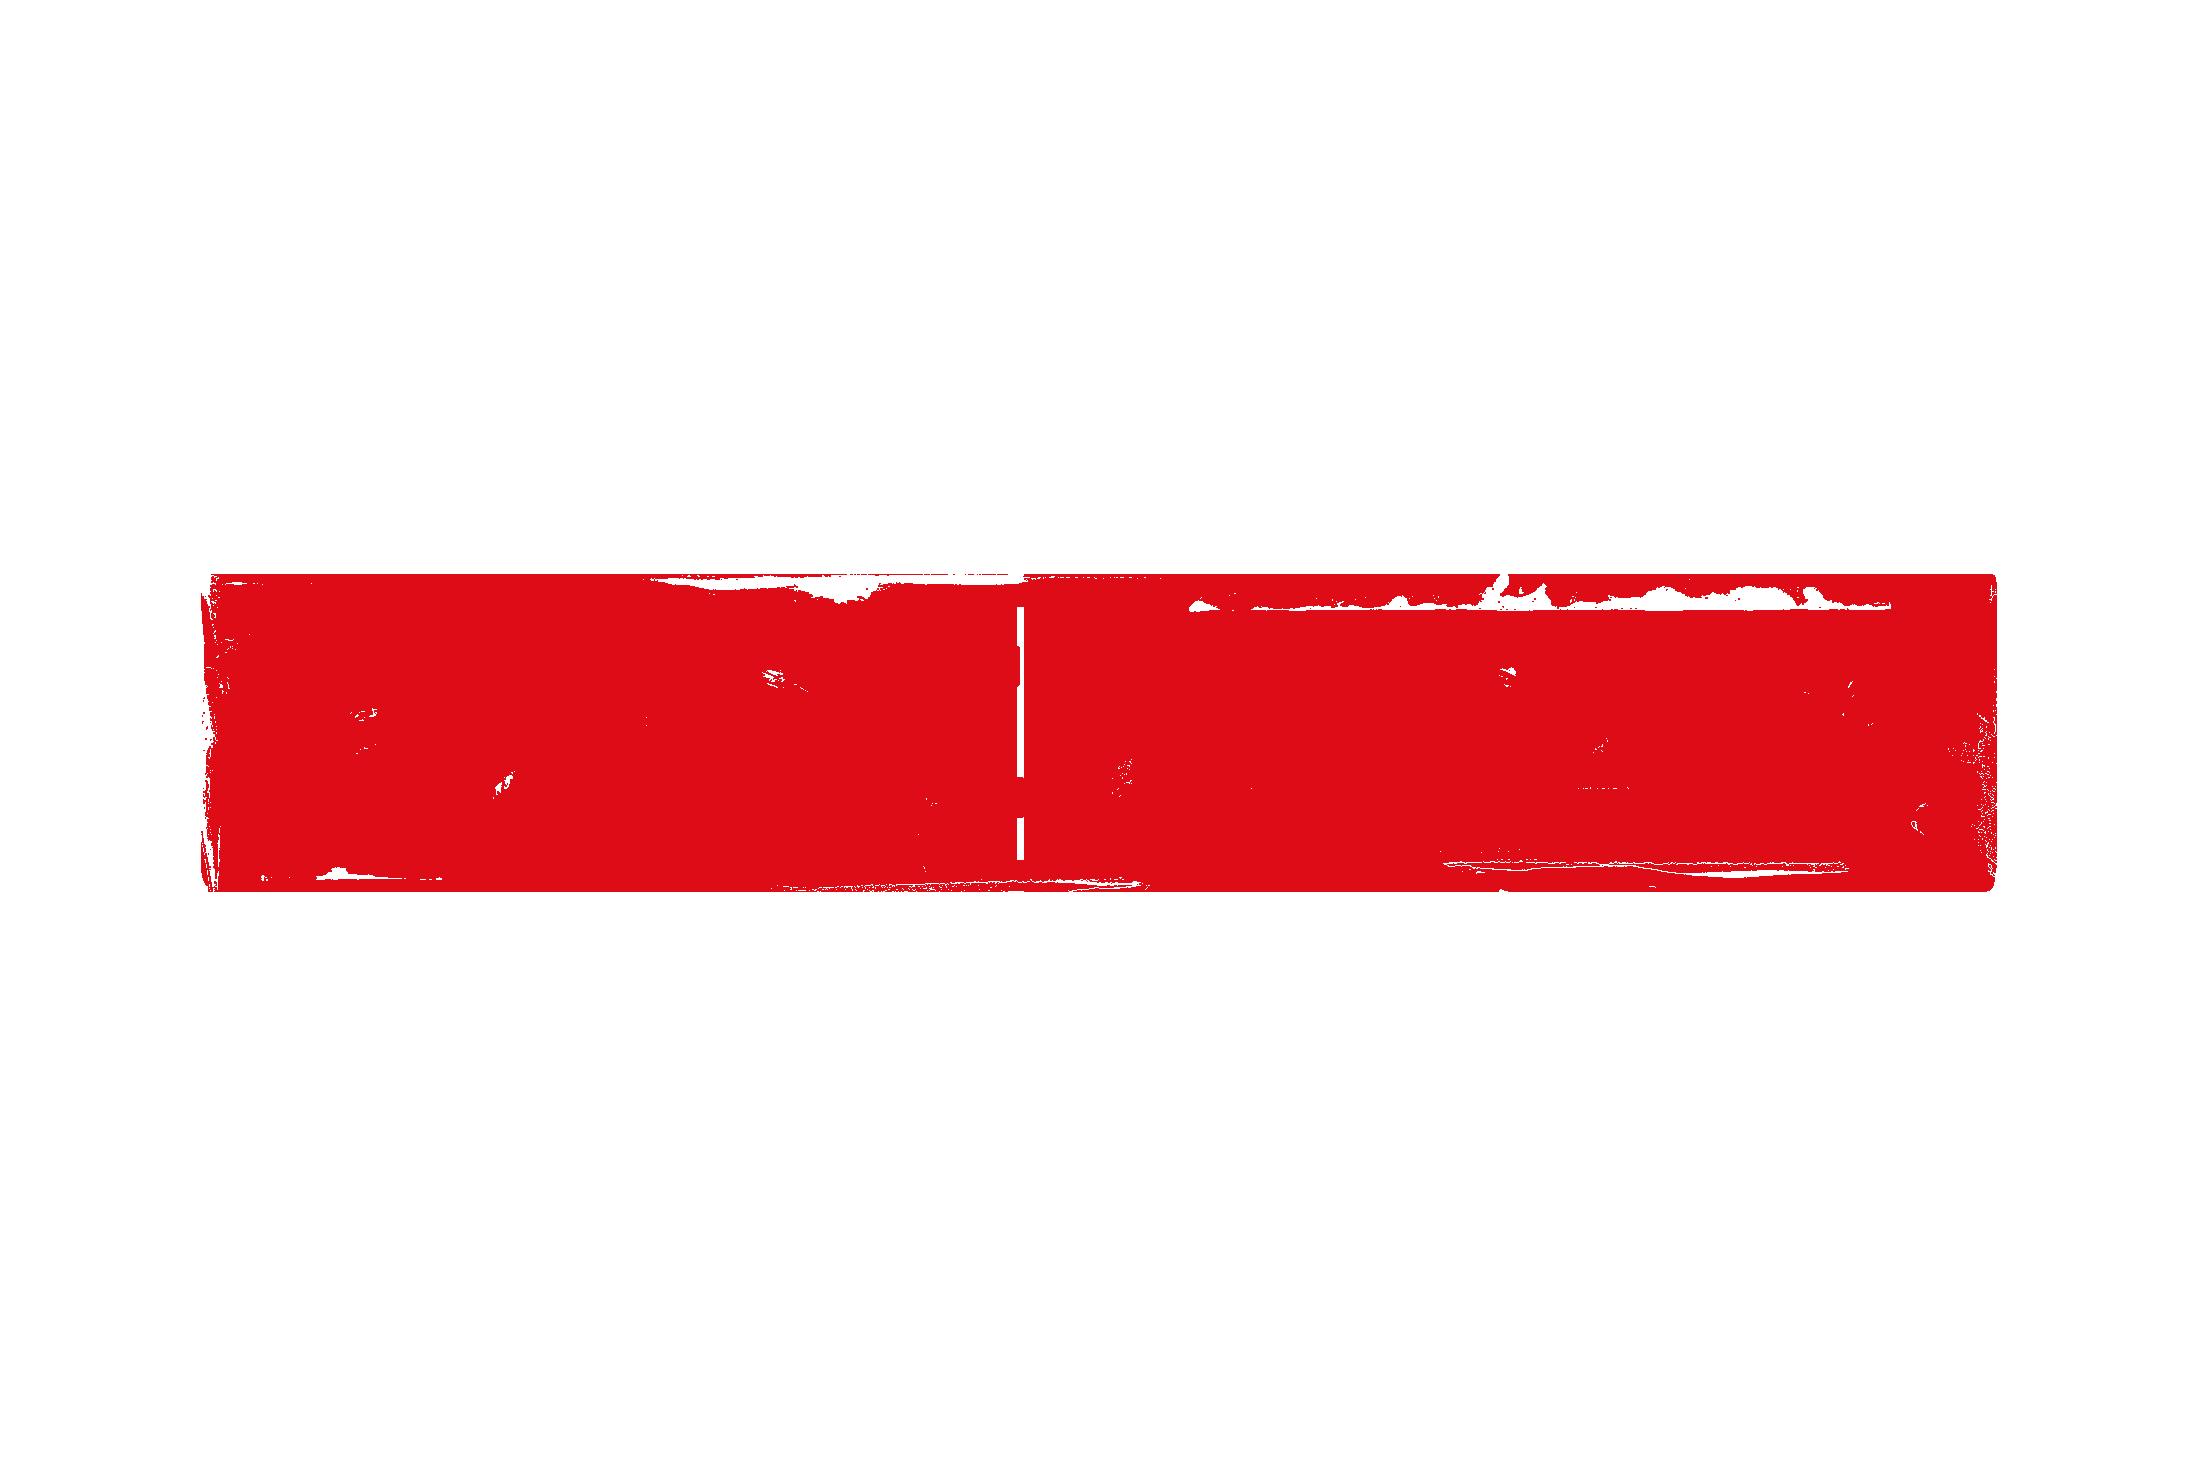 Spoiler alert stamp PSD